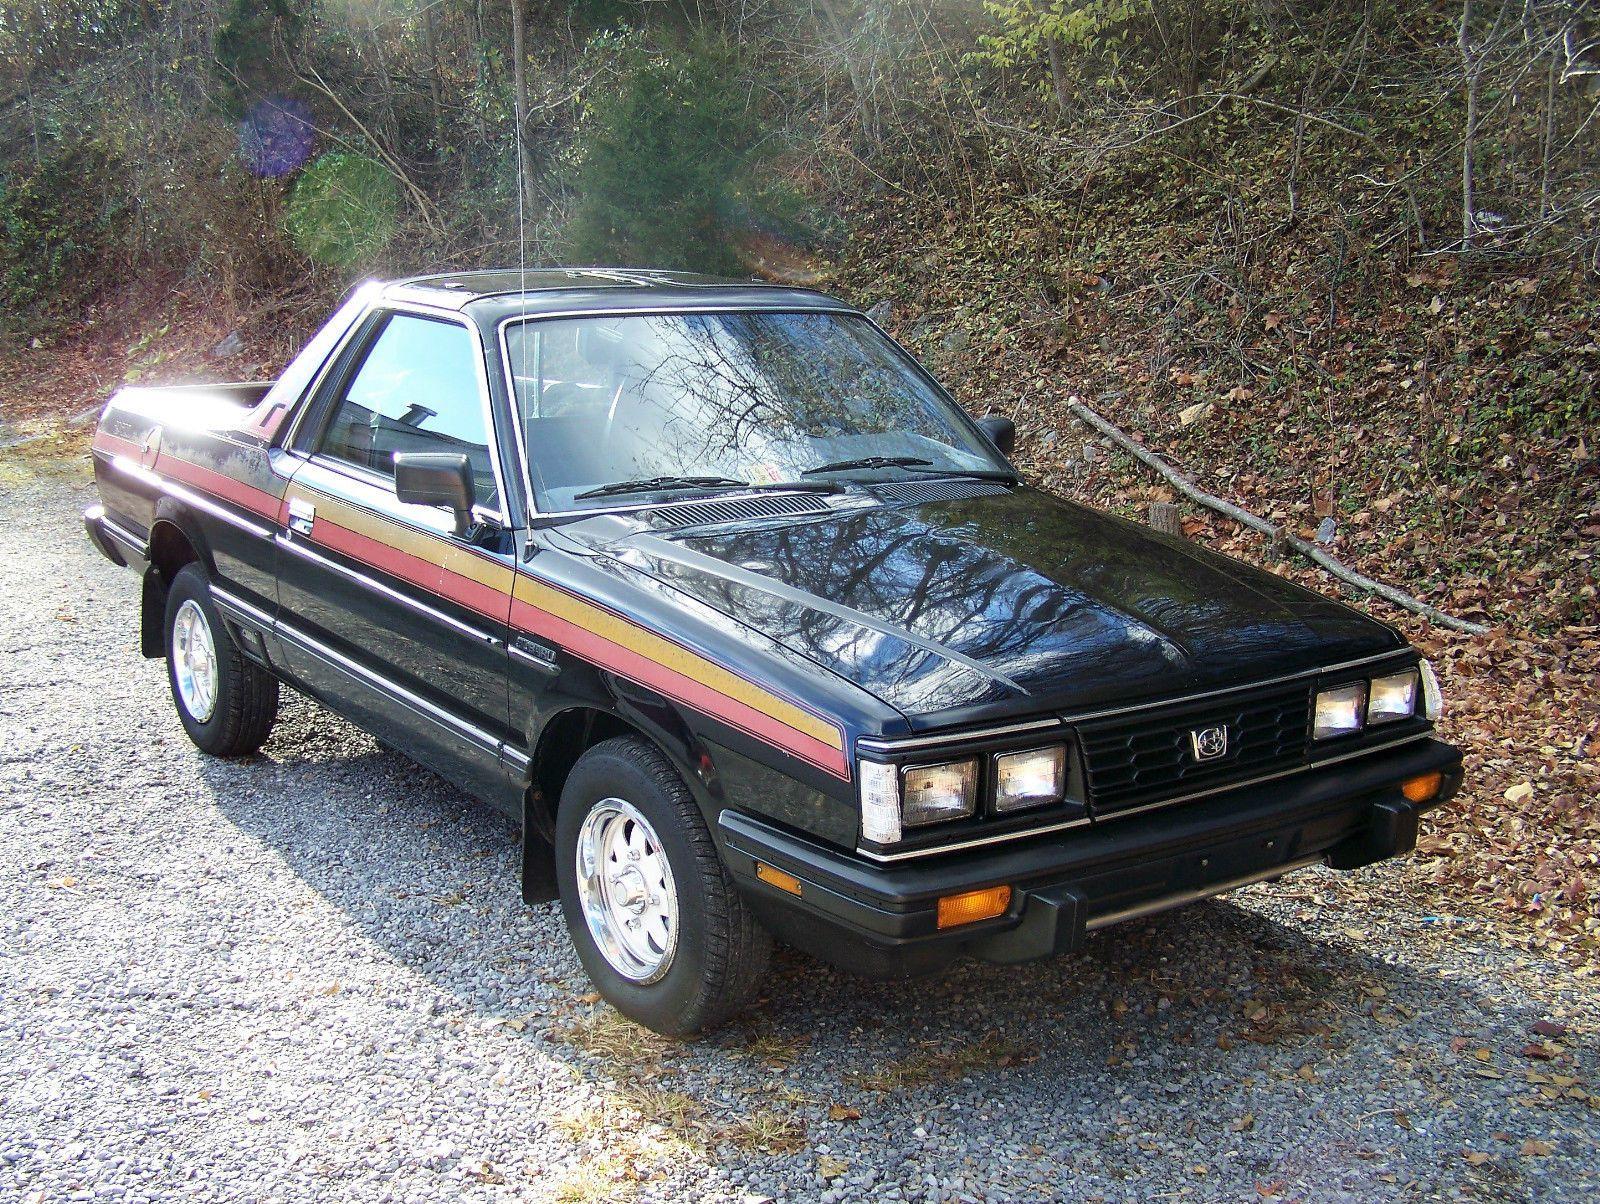 1984 Subaru BRAT GL 4X4 - Low Mileage Survivor for sale. Vintage ...